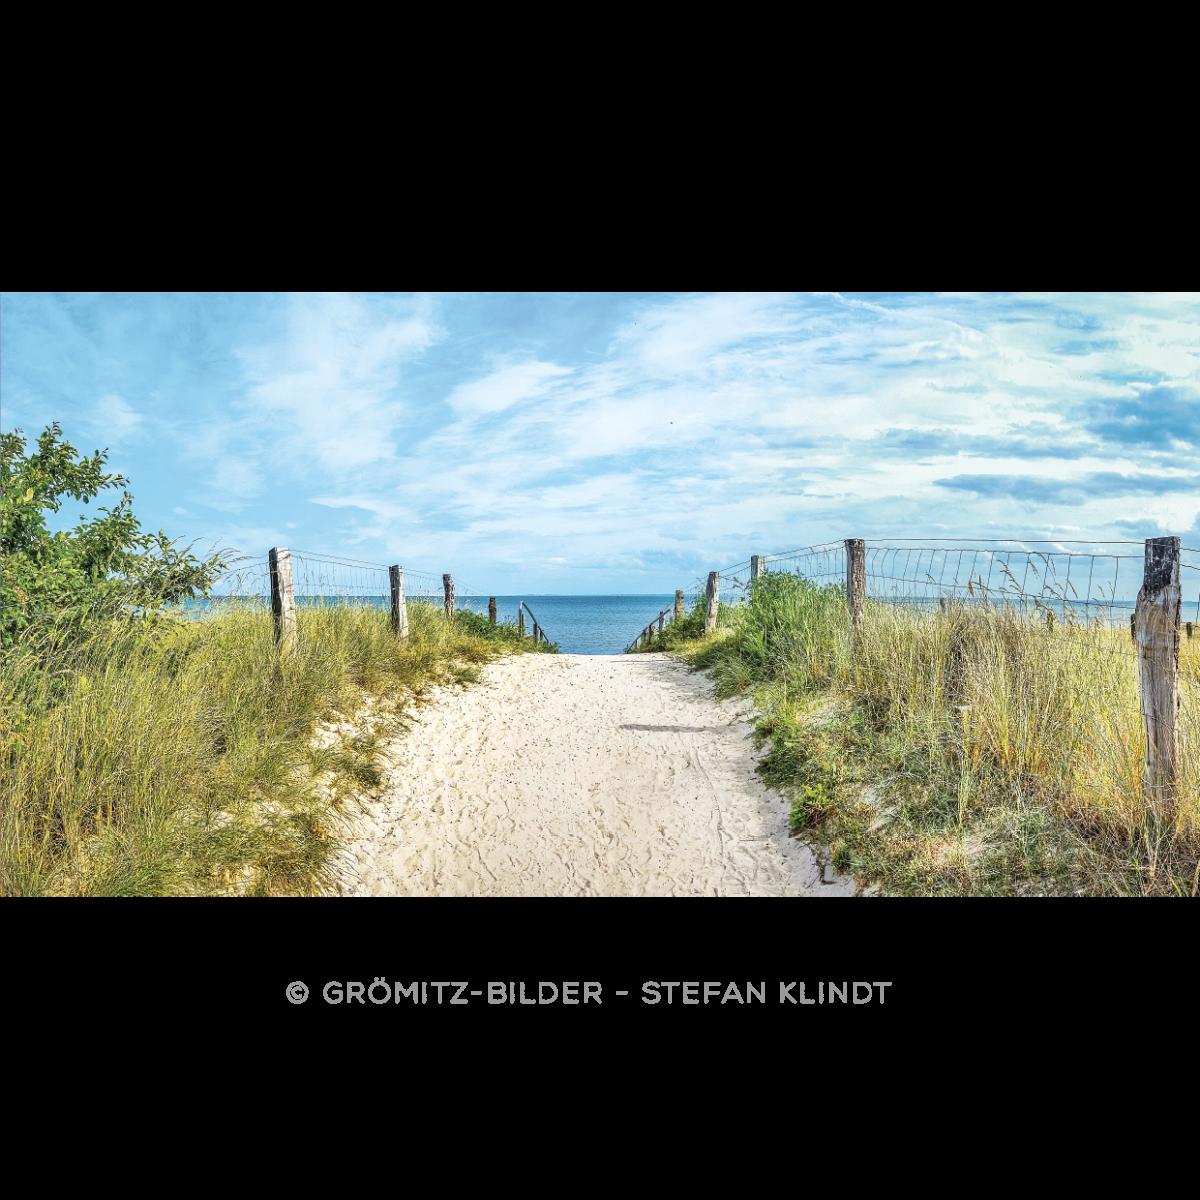 041 Grömitz Bilder - Strandzugang Lensterstrand